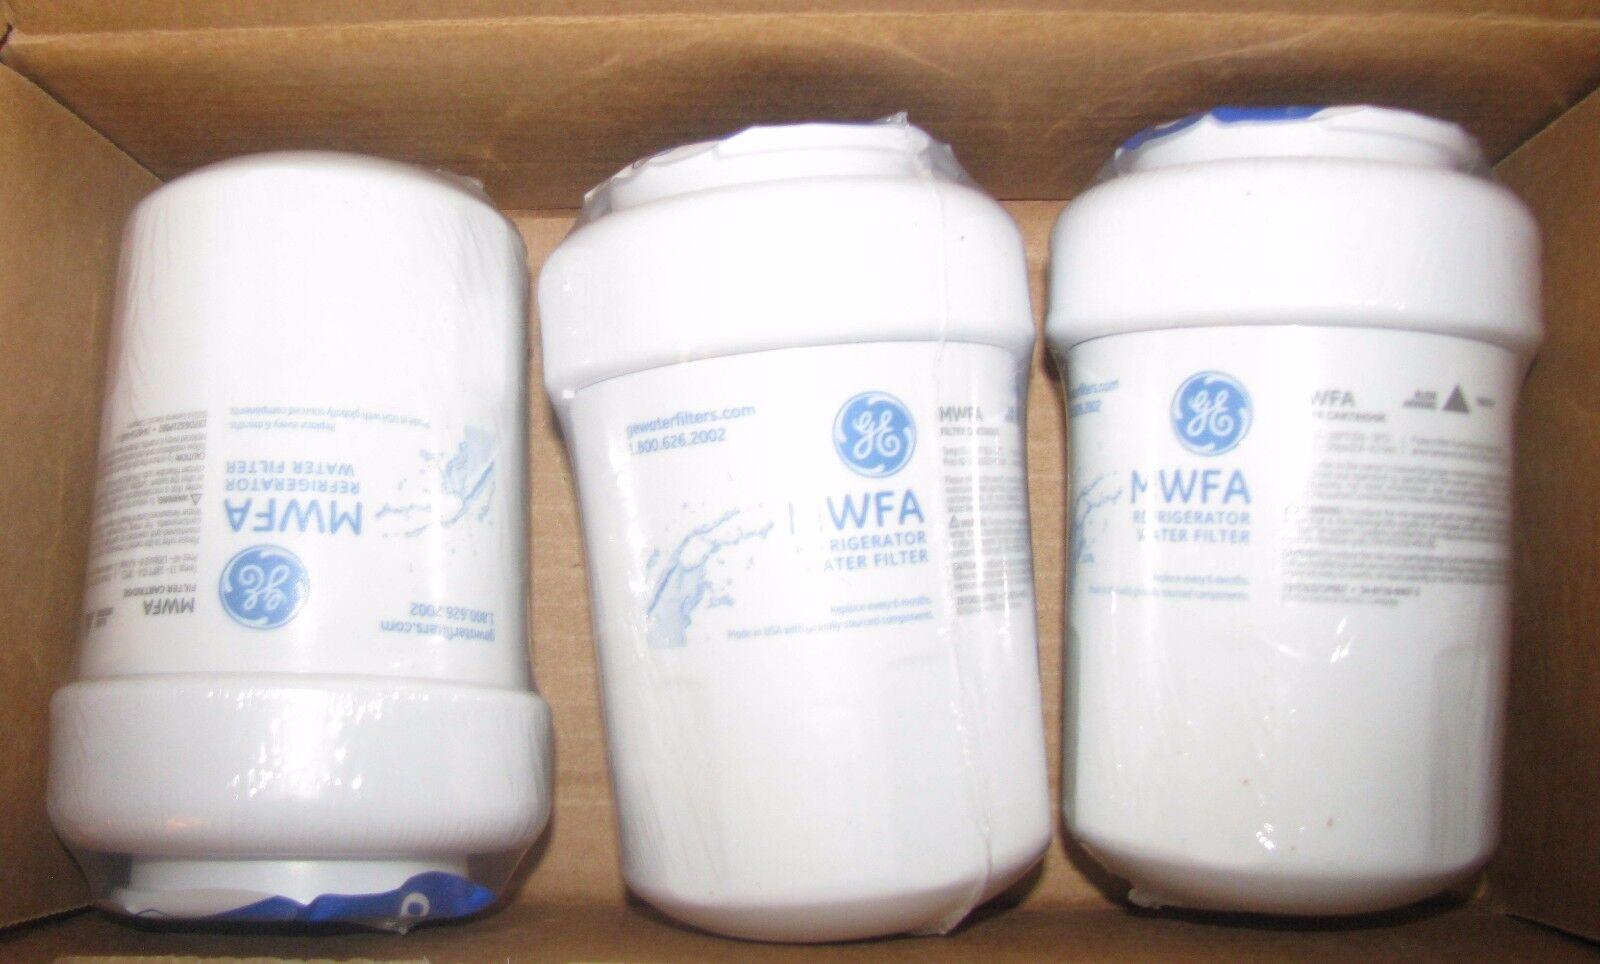 GE MWFA 3PK Refrigerator Water Filter Profile Box of 3